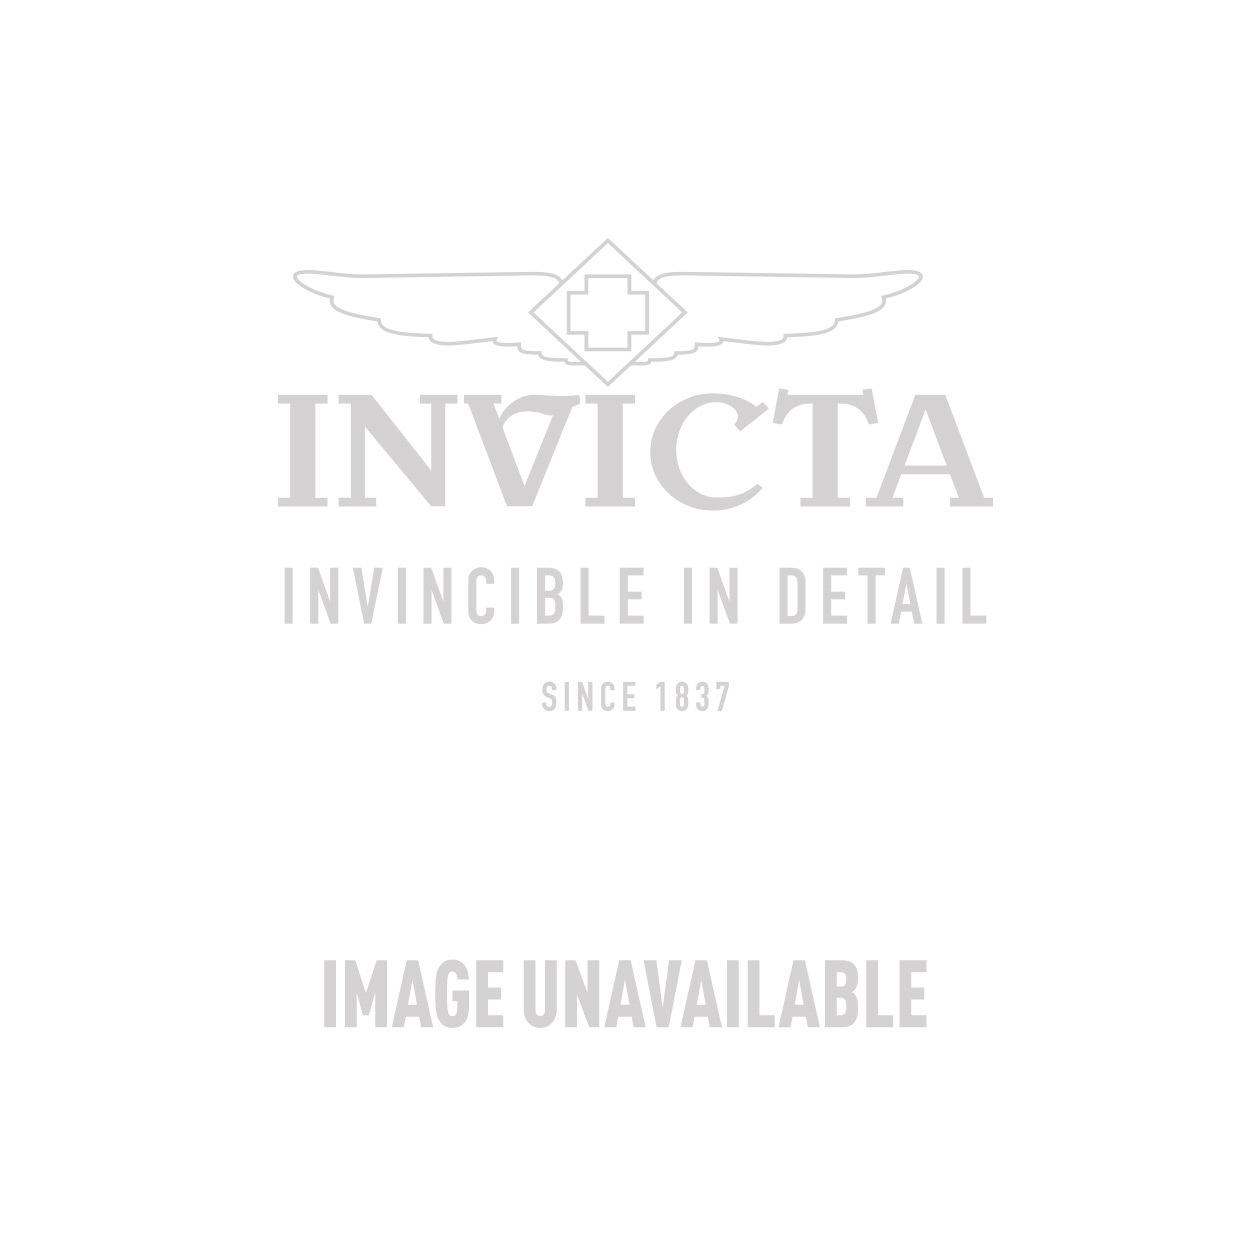 c9cbcc22f Invicta Akula Mens Quartz 58mm Black Case Black, Yellow Dial - Model 23106